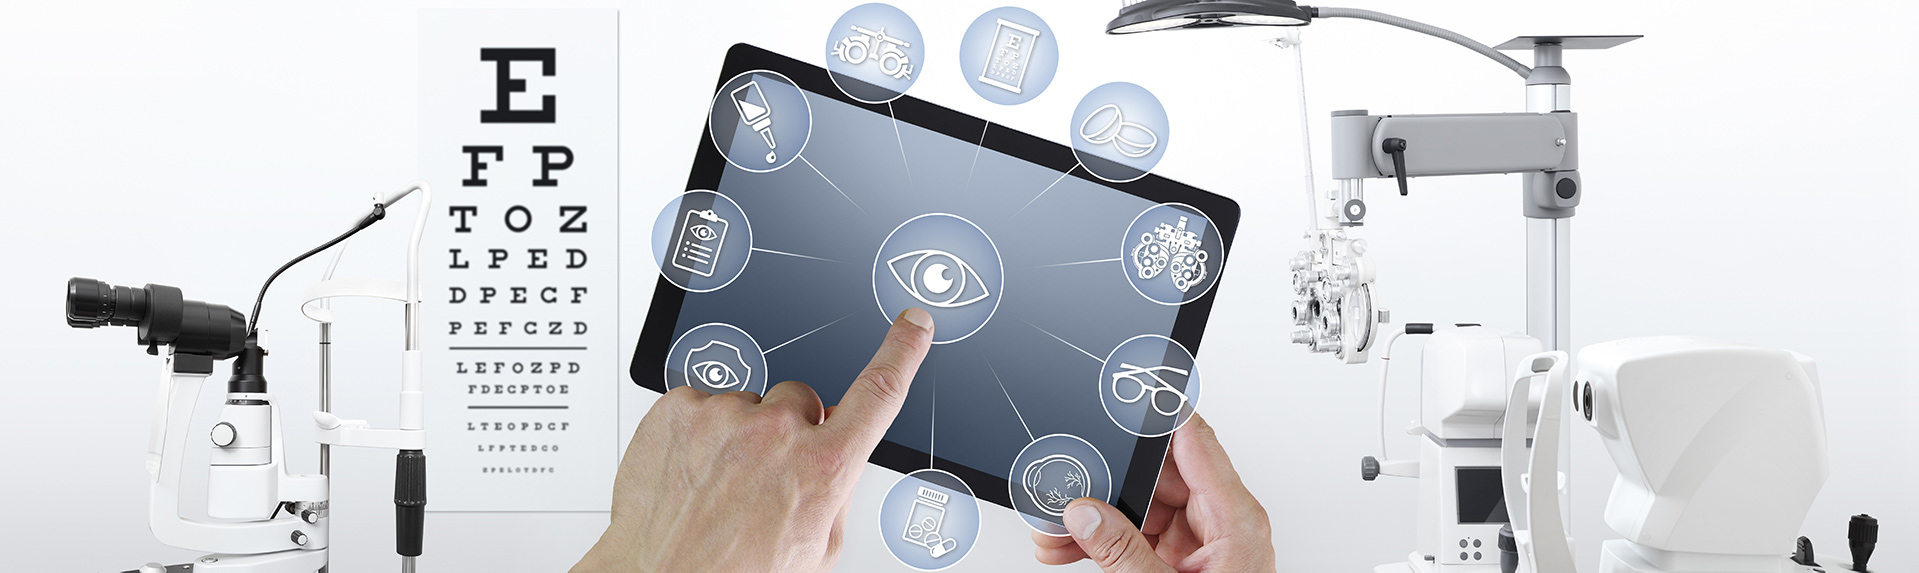 360 eyecare - telehealth, teleoptometry, virtual consultations